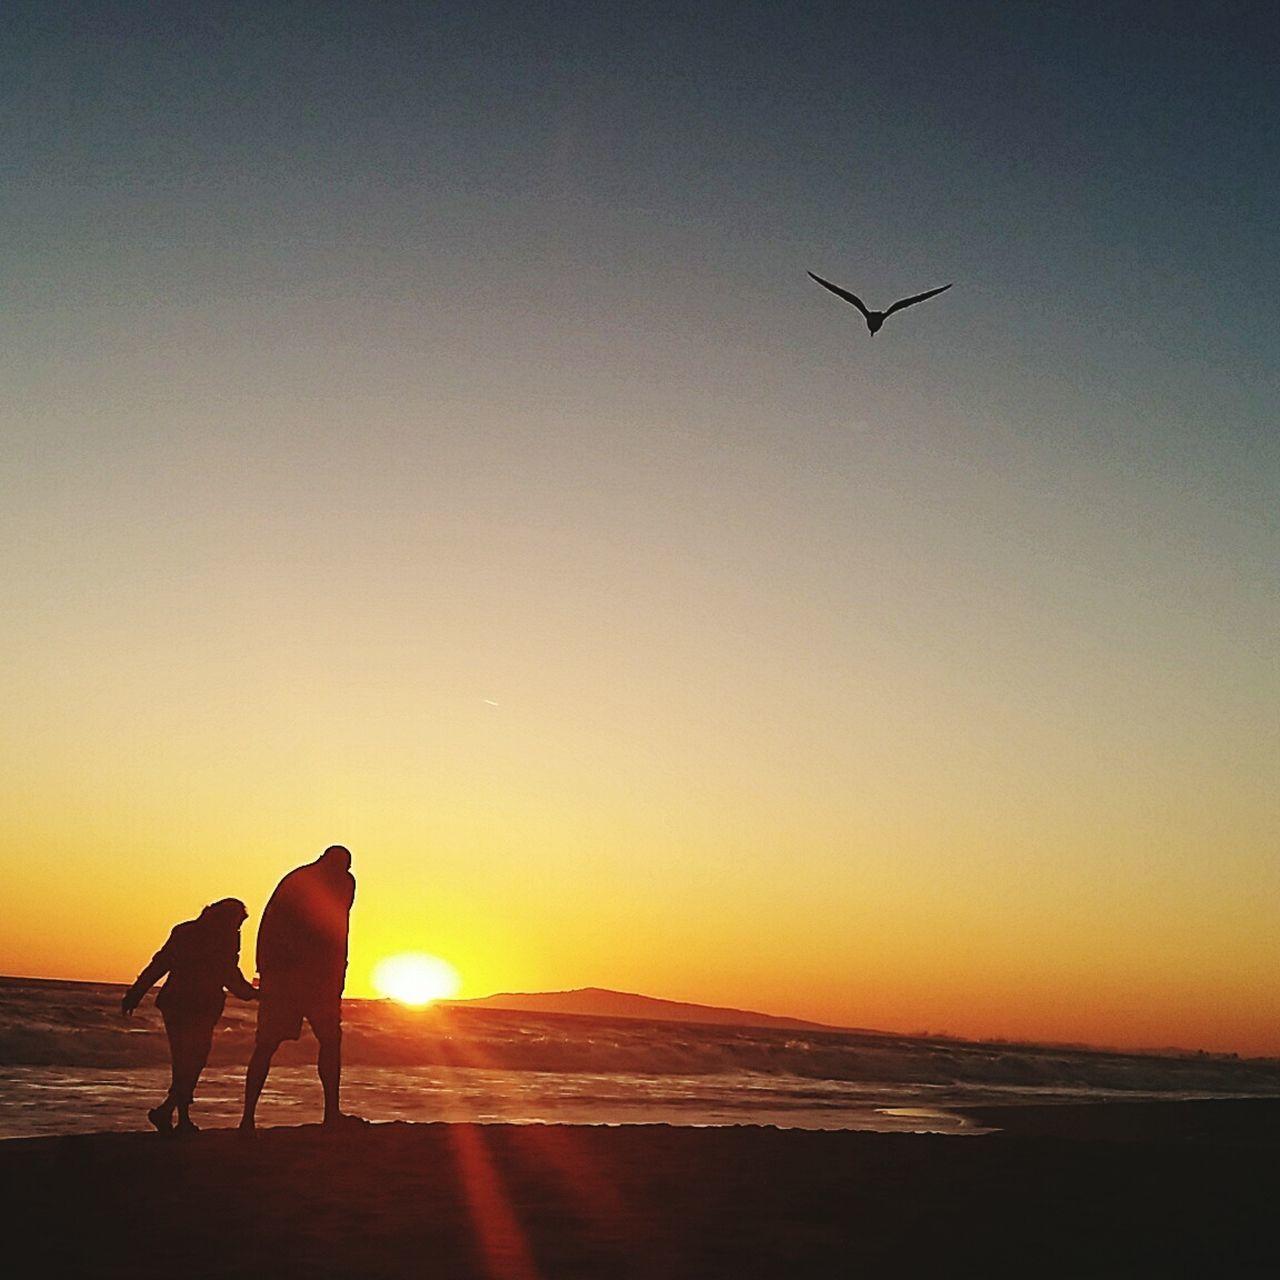 Lifeisbeautiful Sunset Love ♥ Together Beach Photography Hello World Enjoying Life Today :) Nice Weather Nice View So Beautiful ♥♥ FreeTime First Eyeem Photo 함께걷는인생 조으다 순간